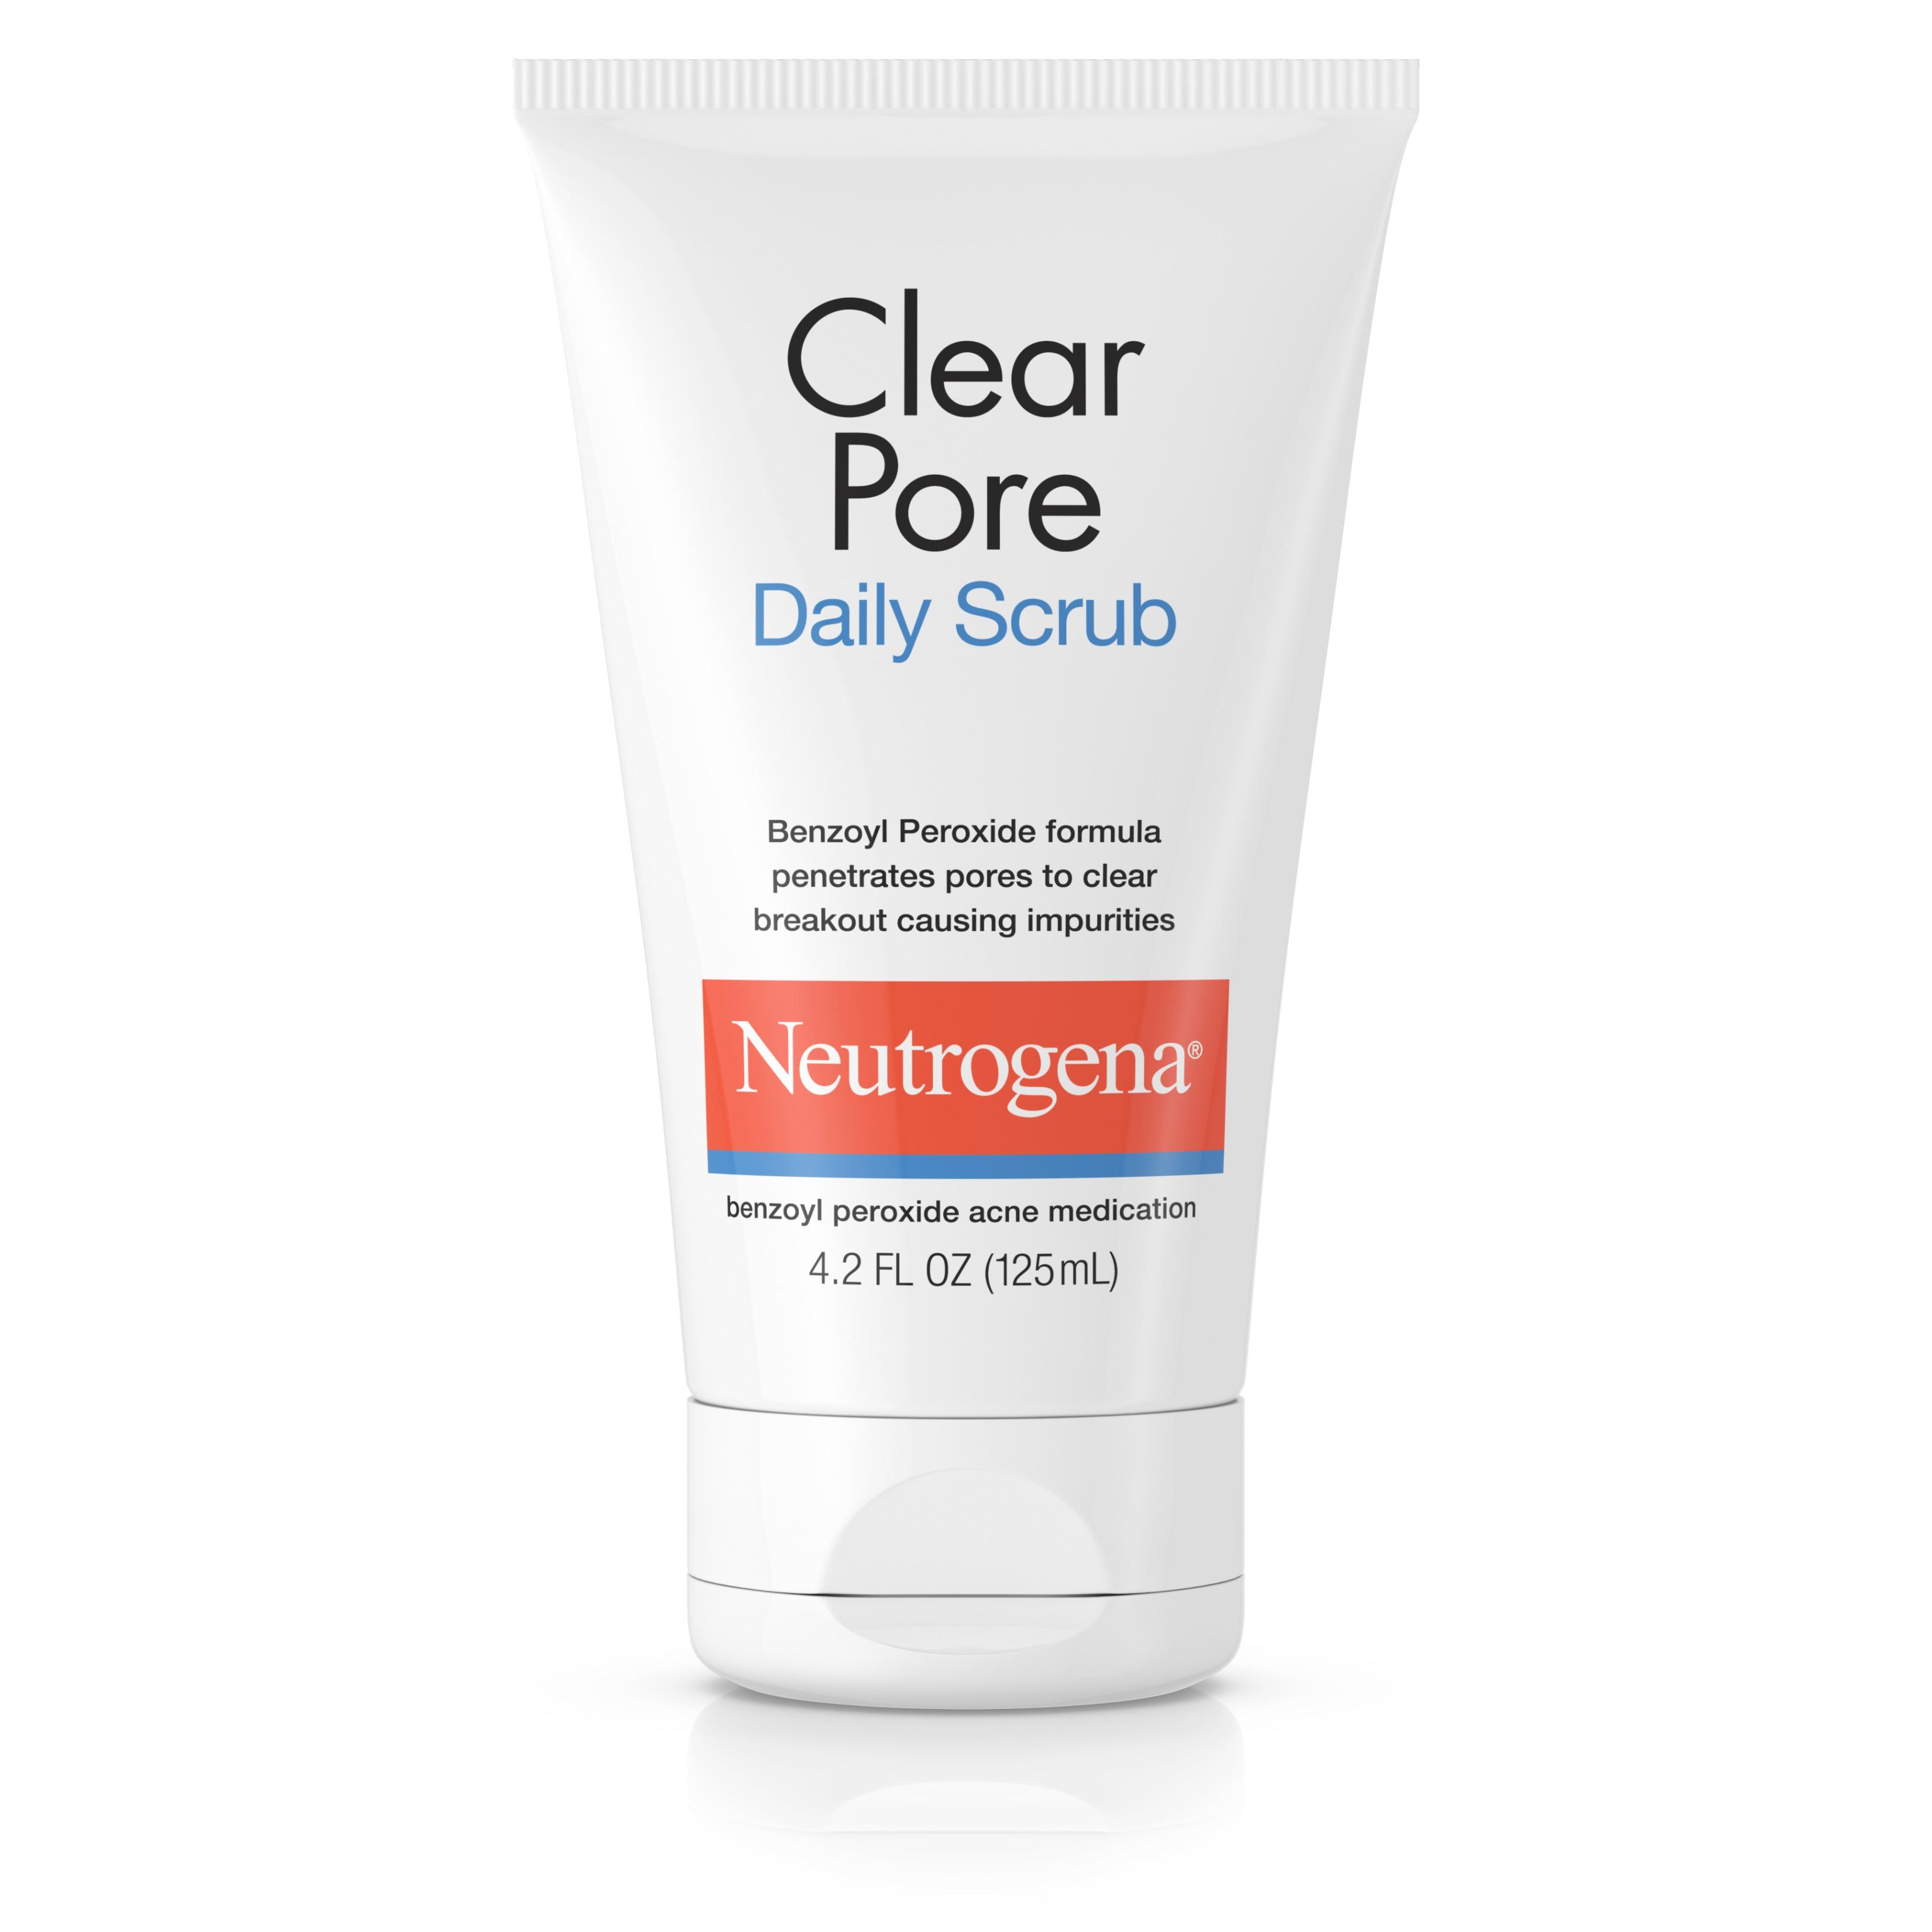 Neutrogena Clear Pore Daily Scrub With Benzoyl Peroxide, 4.2 Fl. Oz. - Walmart.com